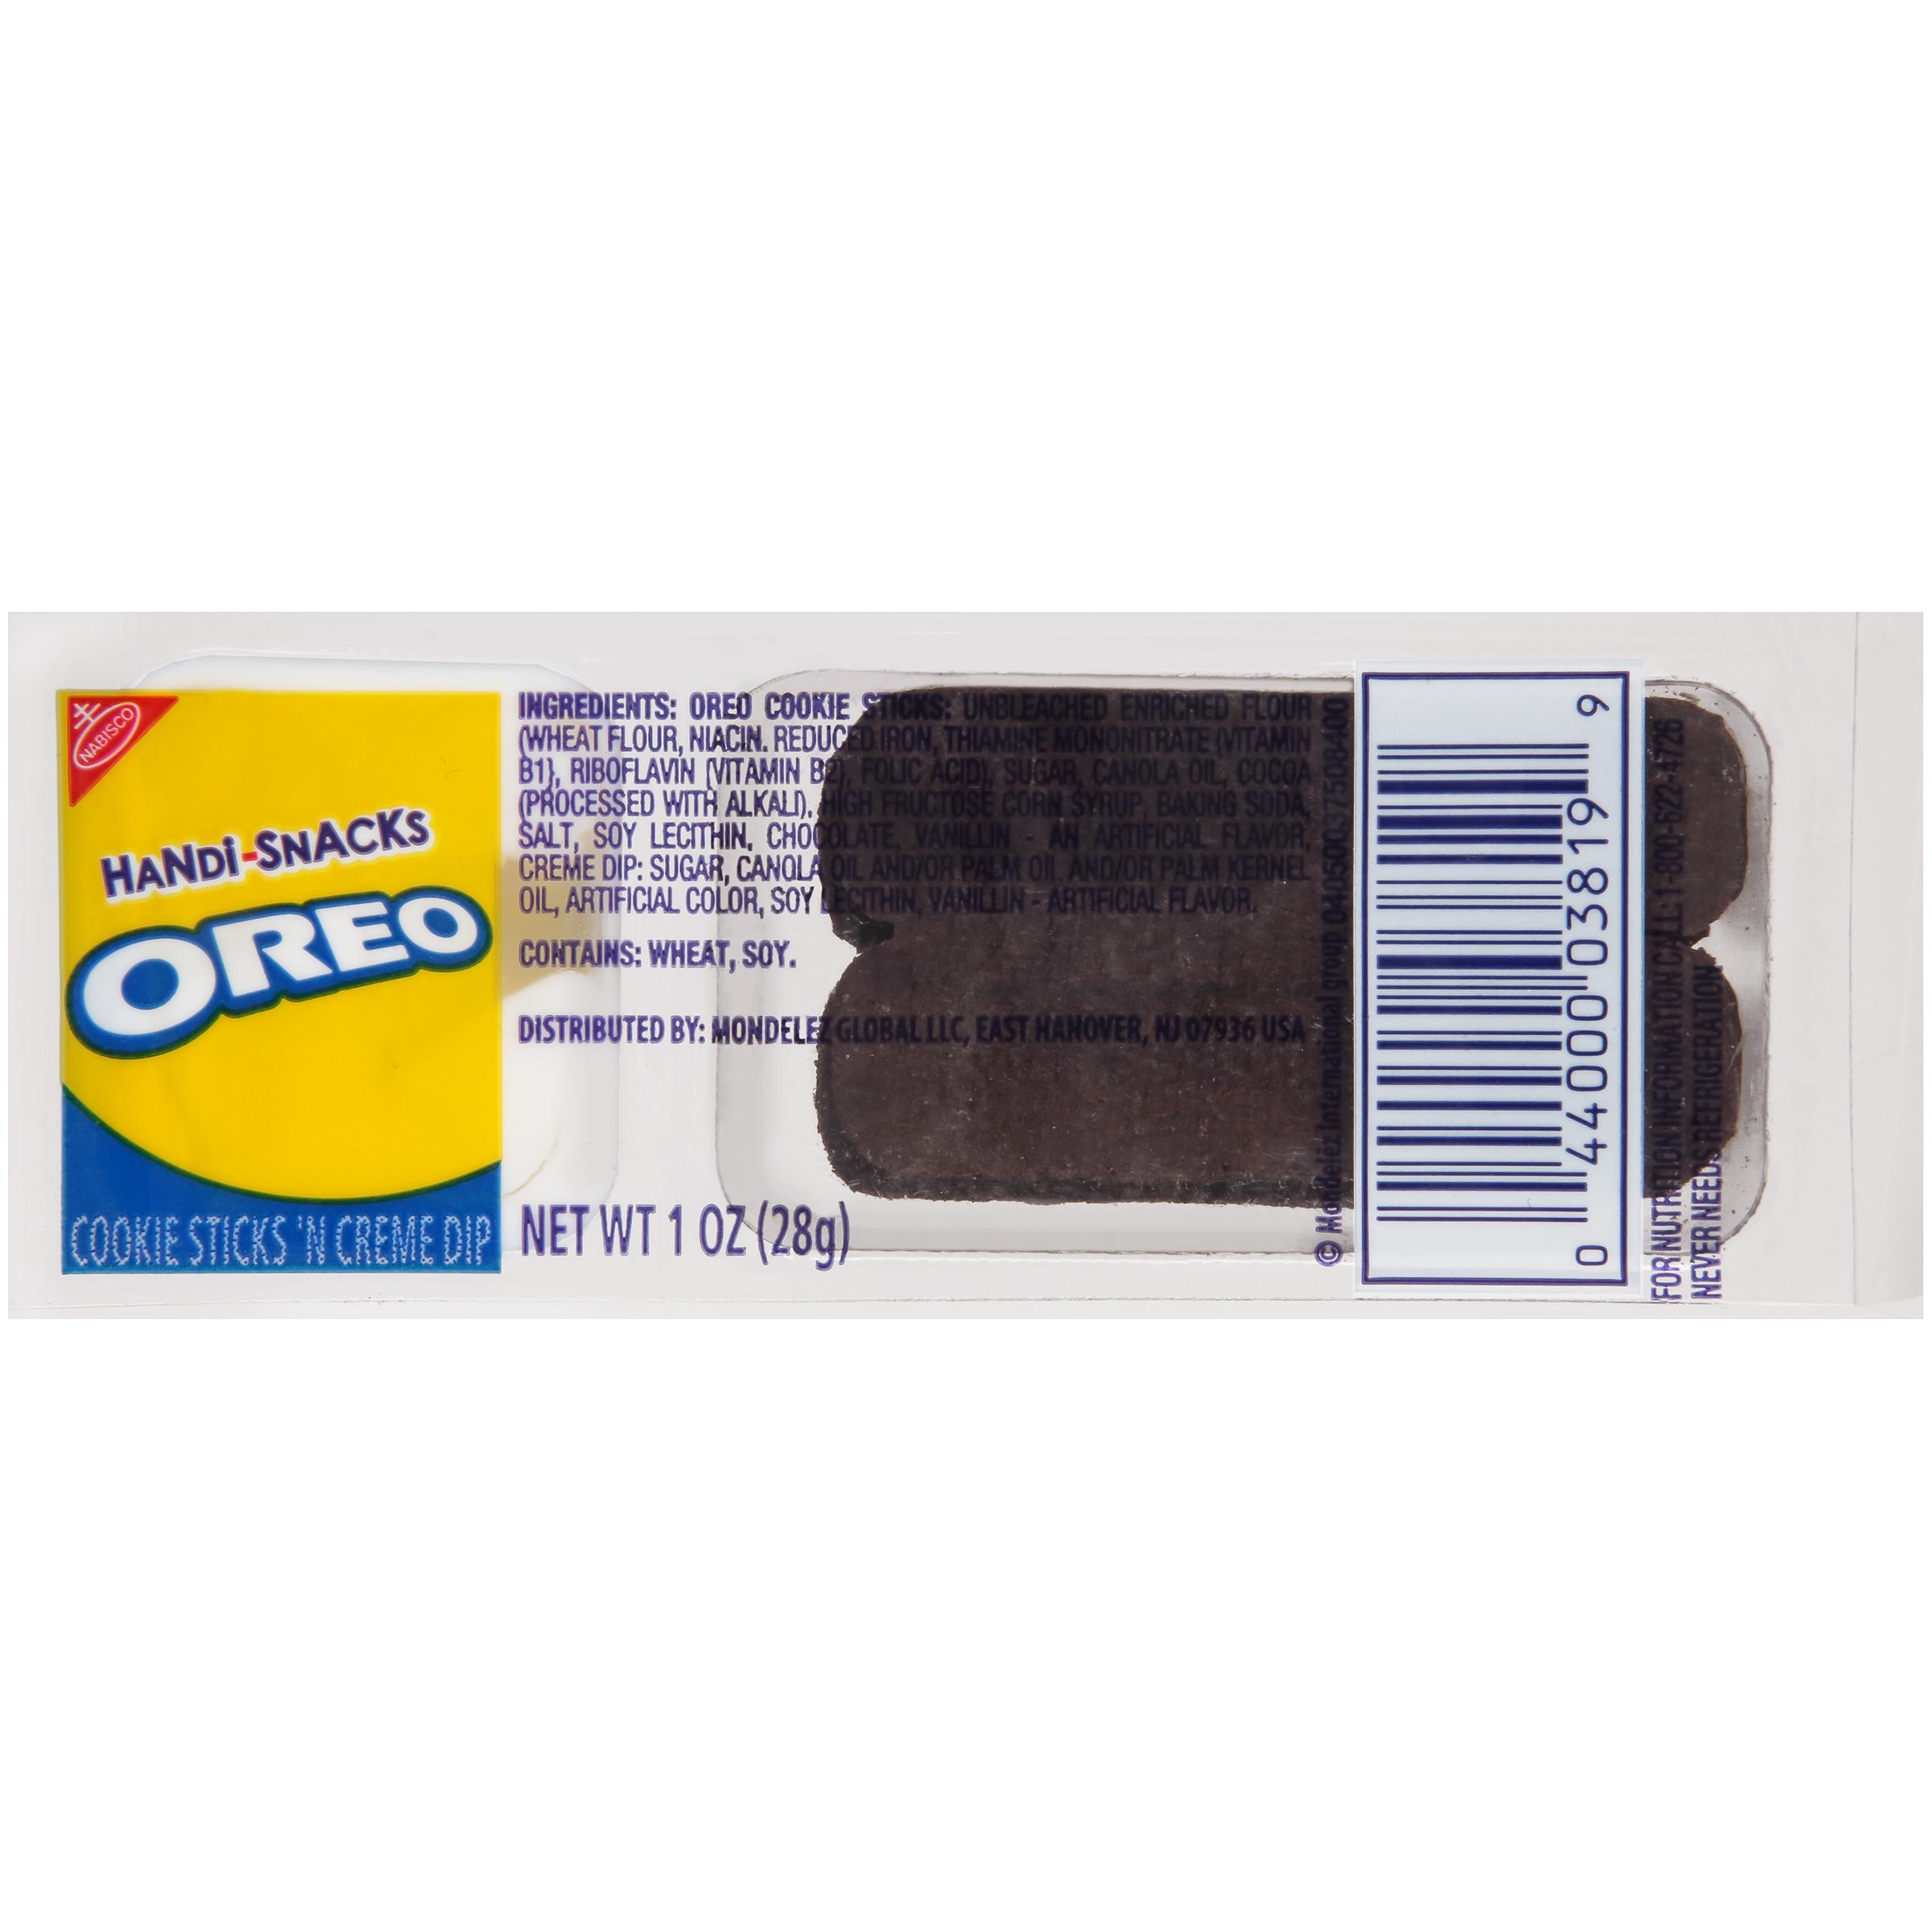 HANDI-SNACKS Oreo Cookies 1 oz